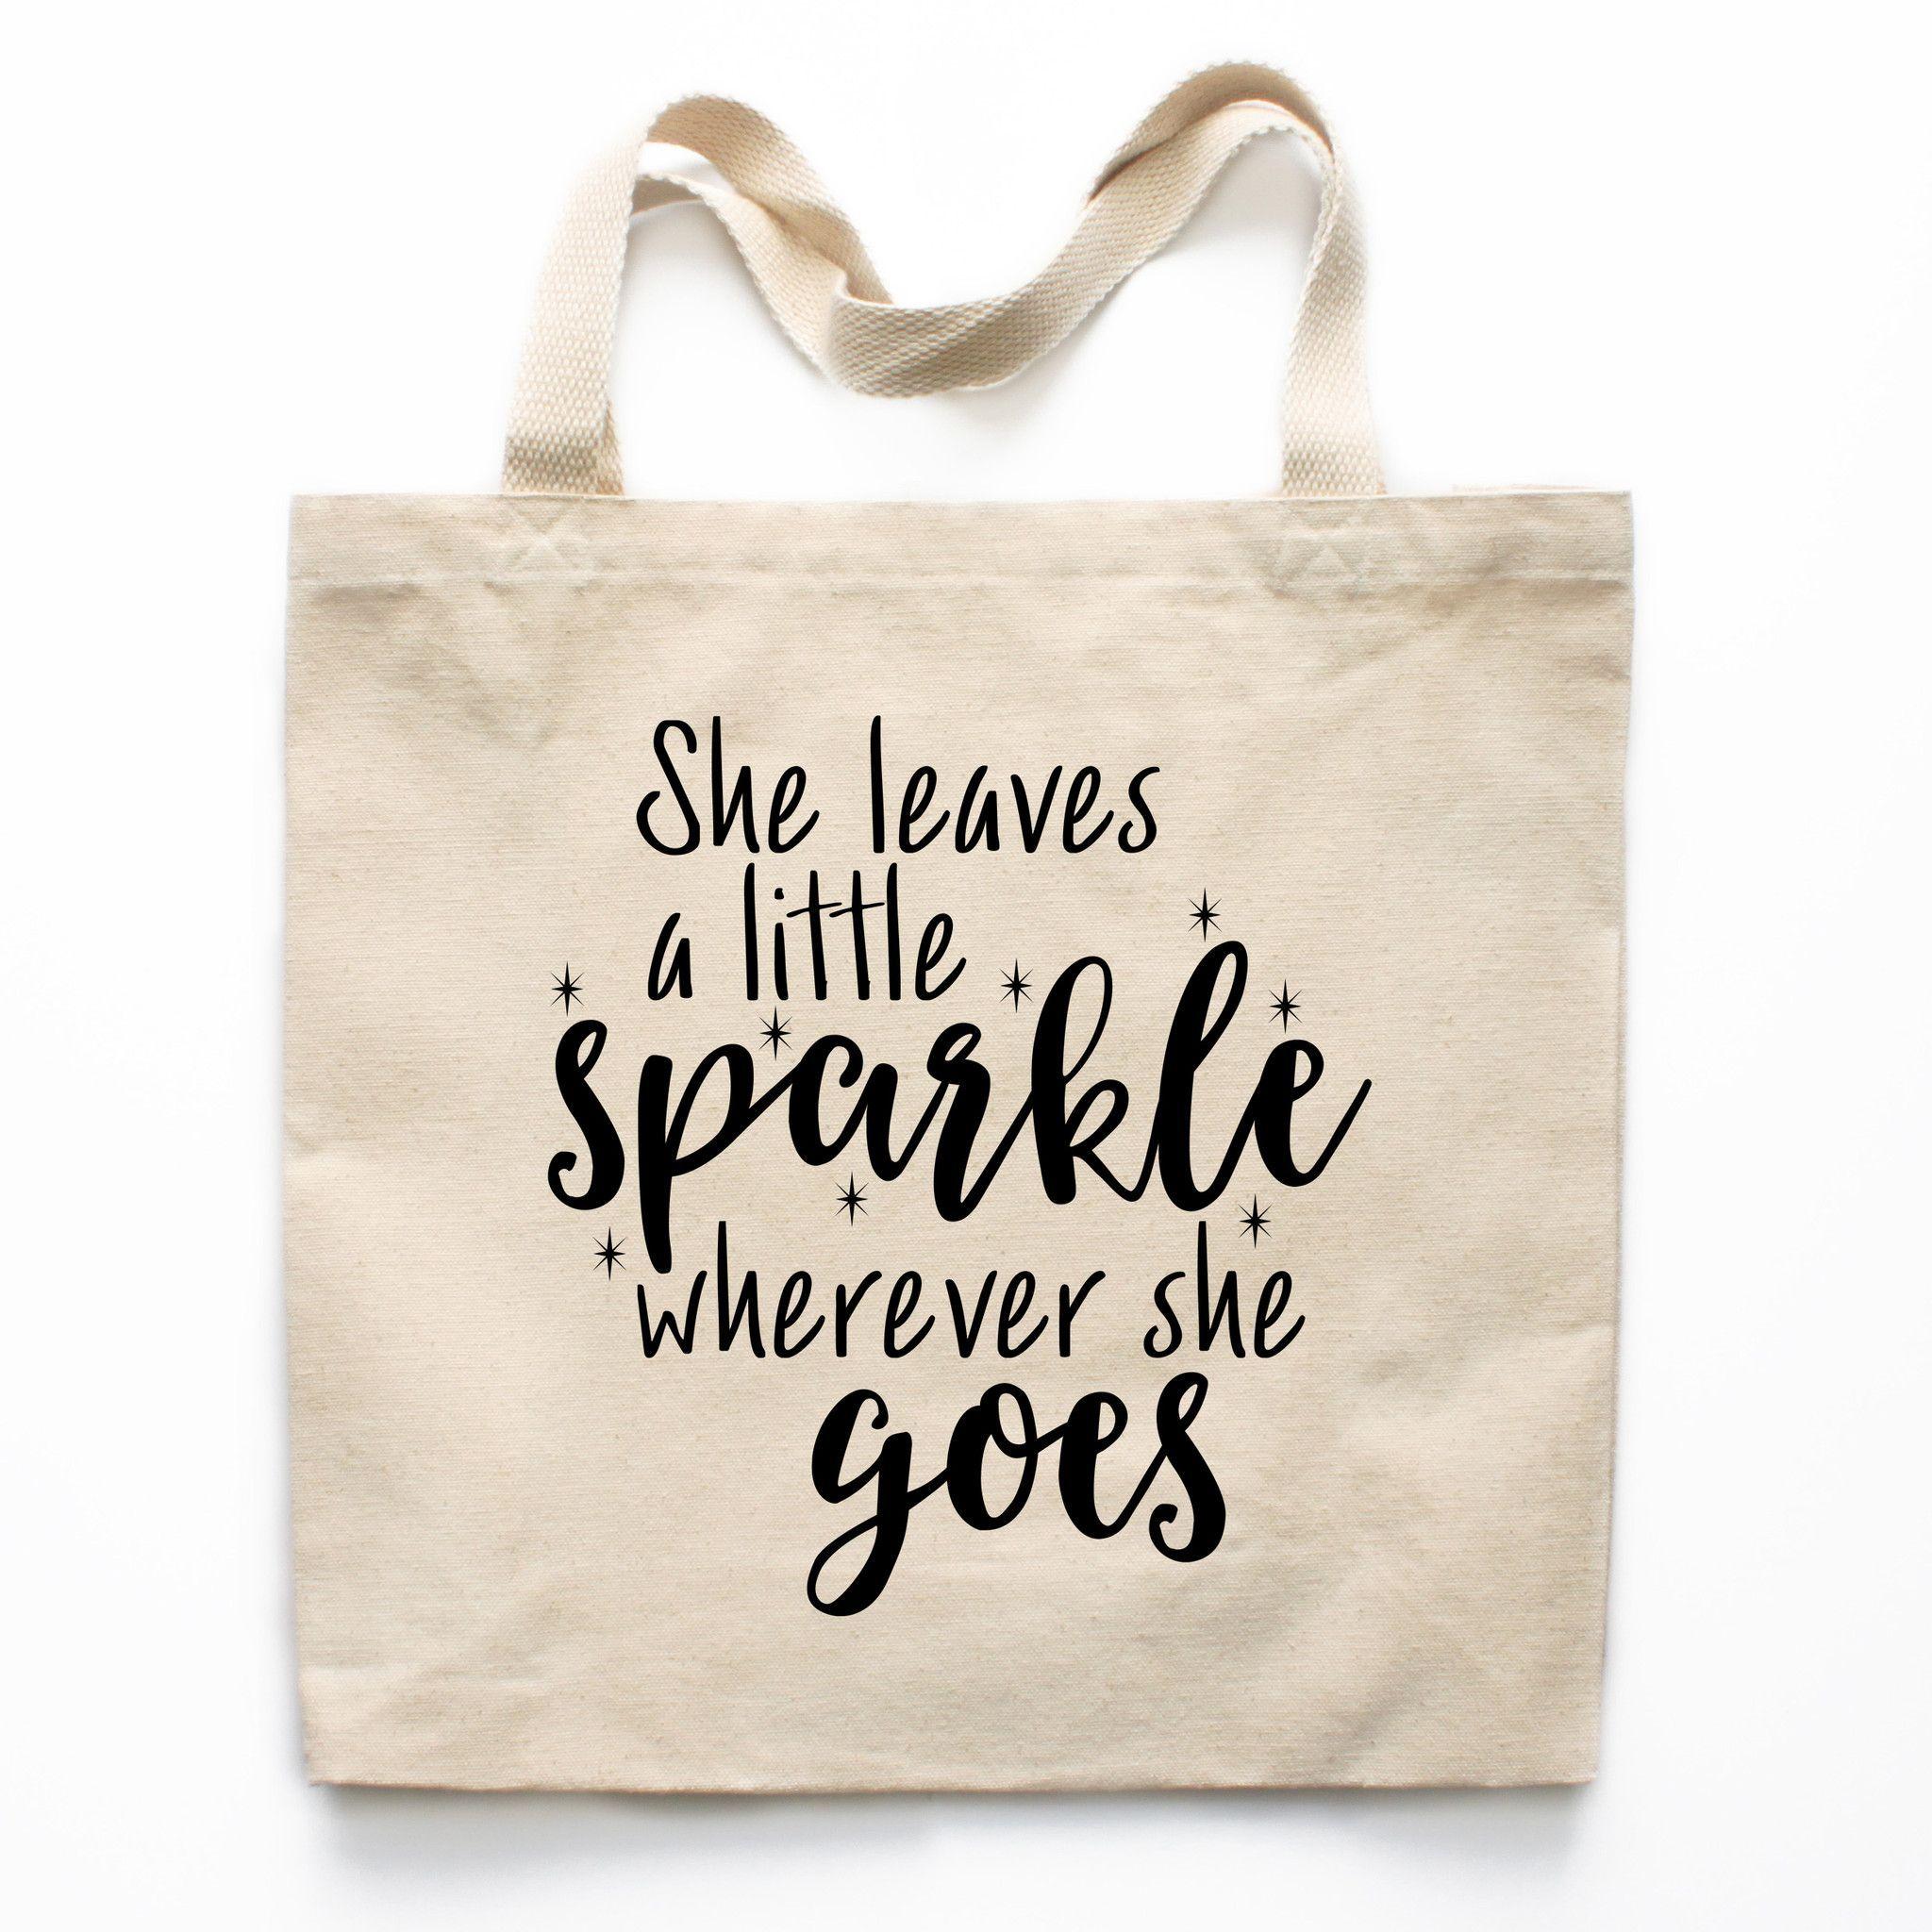 848c3e5ff She Leaves A Little Sparkle Wherever She Goes Canvas Tote Bag ...